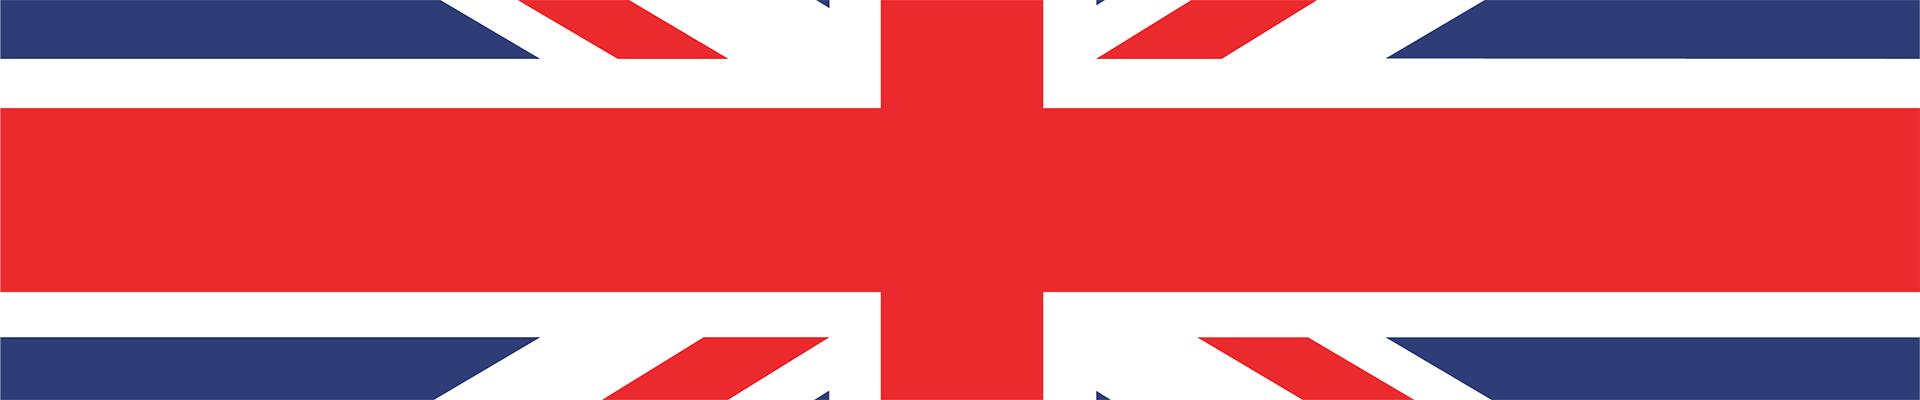 how to watch Netherlands vs Czech Republic live stream — British flag